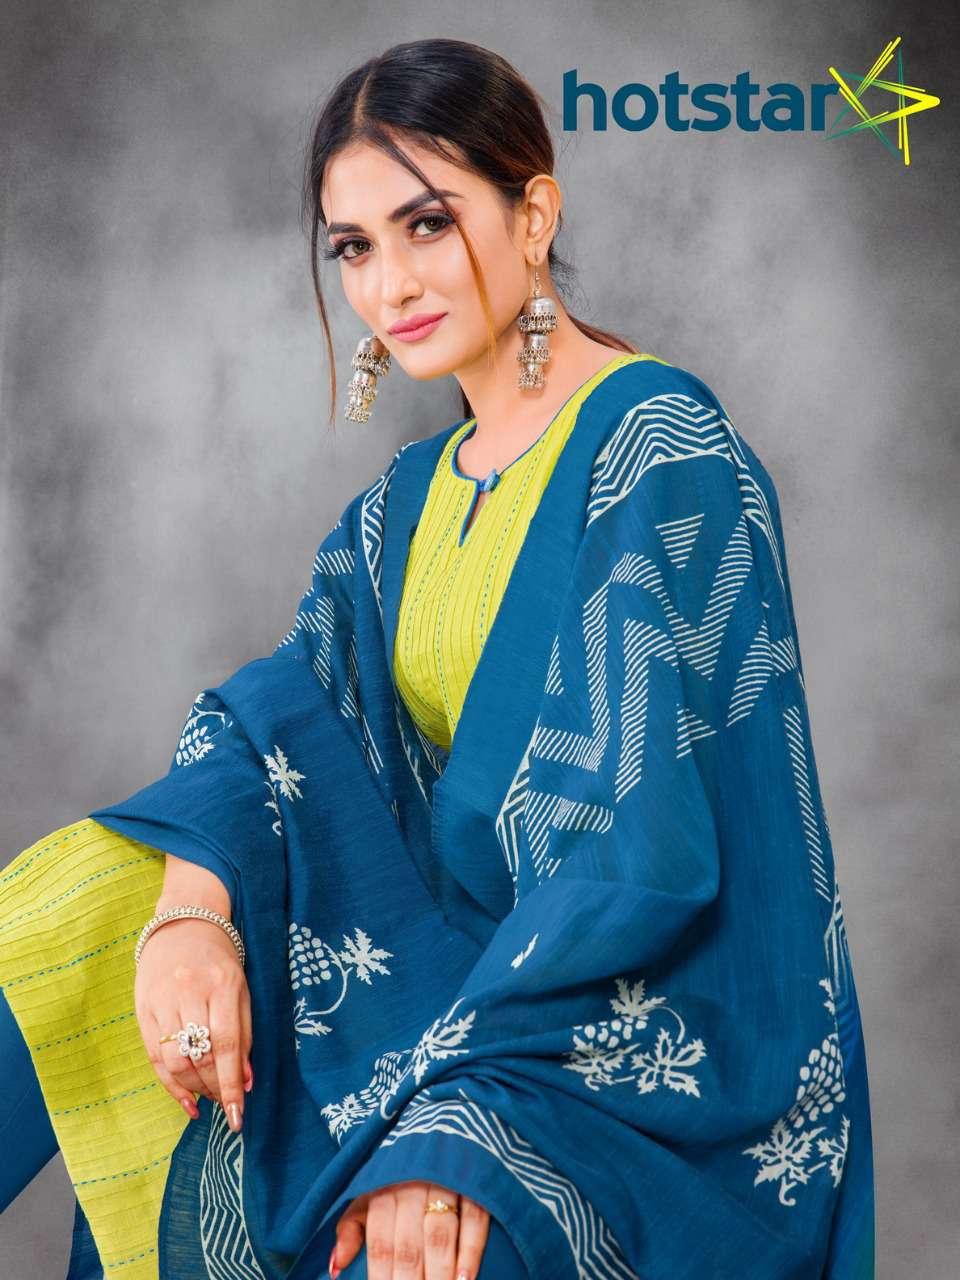 Kayce Kasmeera Hotstar Salwar Suit Wholesale Catalog 11 Pcs 1 - Kayce Kasmeera Hotstar Salwar Suit Wholesale Catalog 11 Pcs